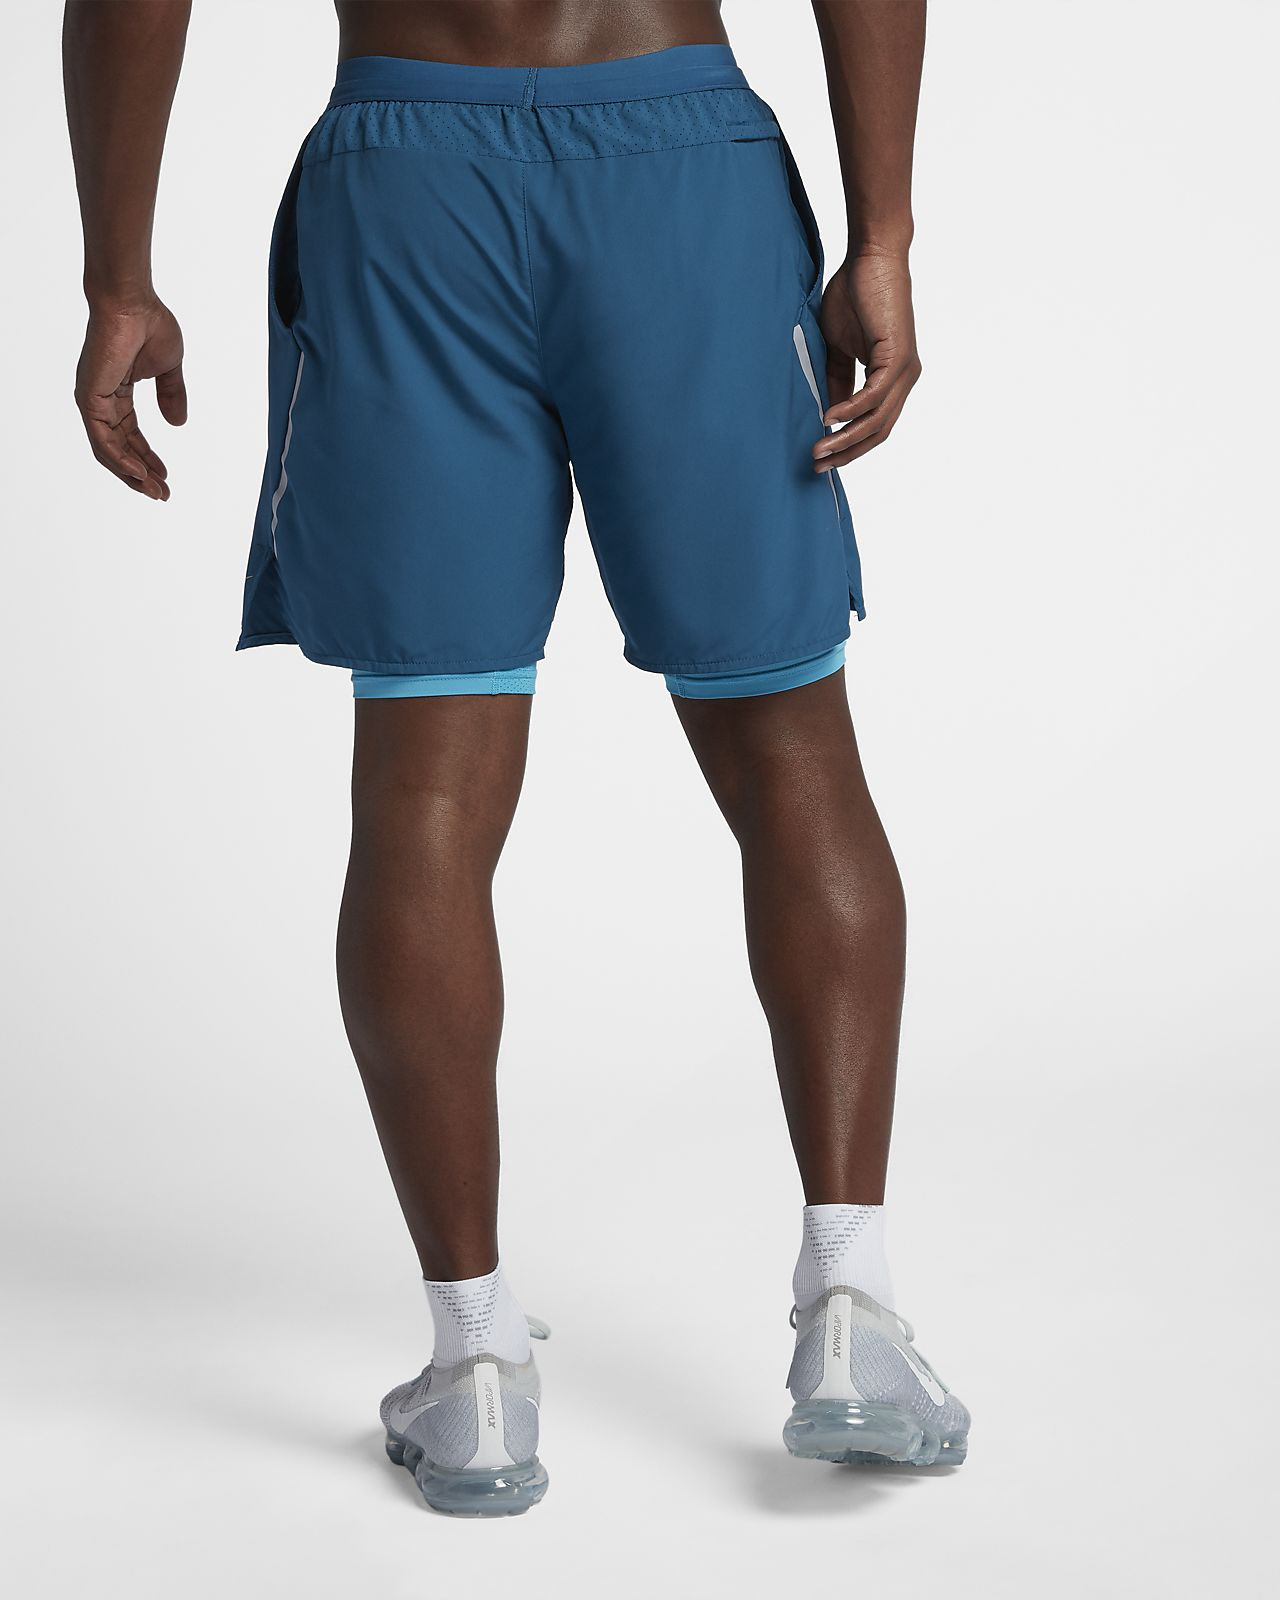 91144437e1f6 Nike Flex Stride Men s 2-in-1 Running Shorts. Nike.com ZA